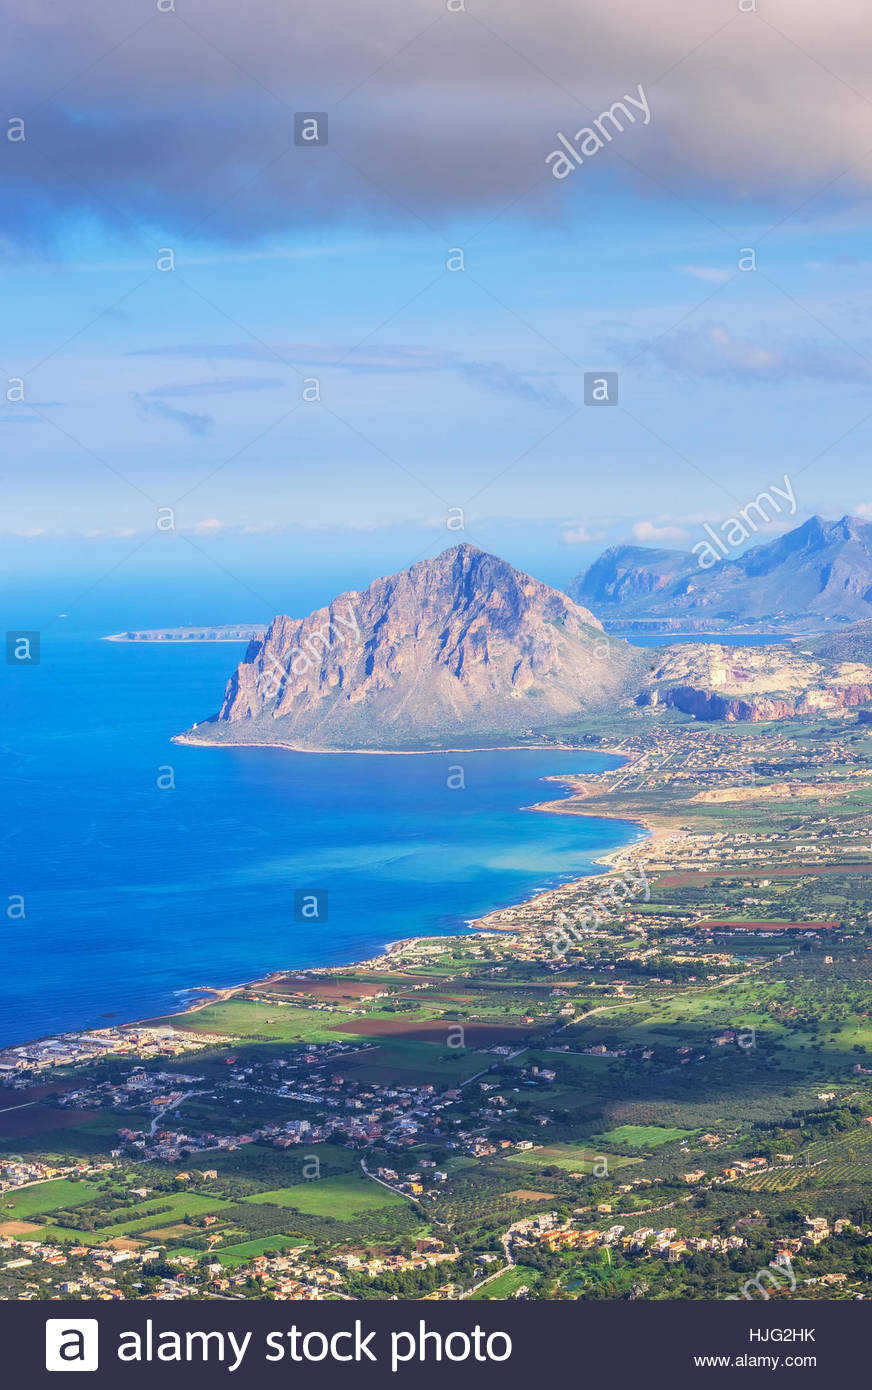 View of Erice and Monte Cofano Erice, Sicily, Italy - Stock Image